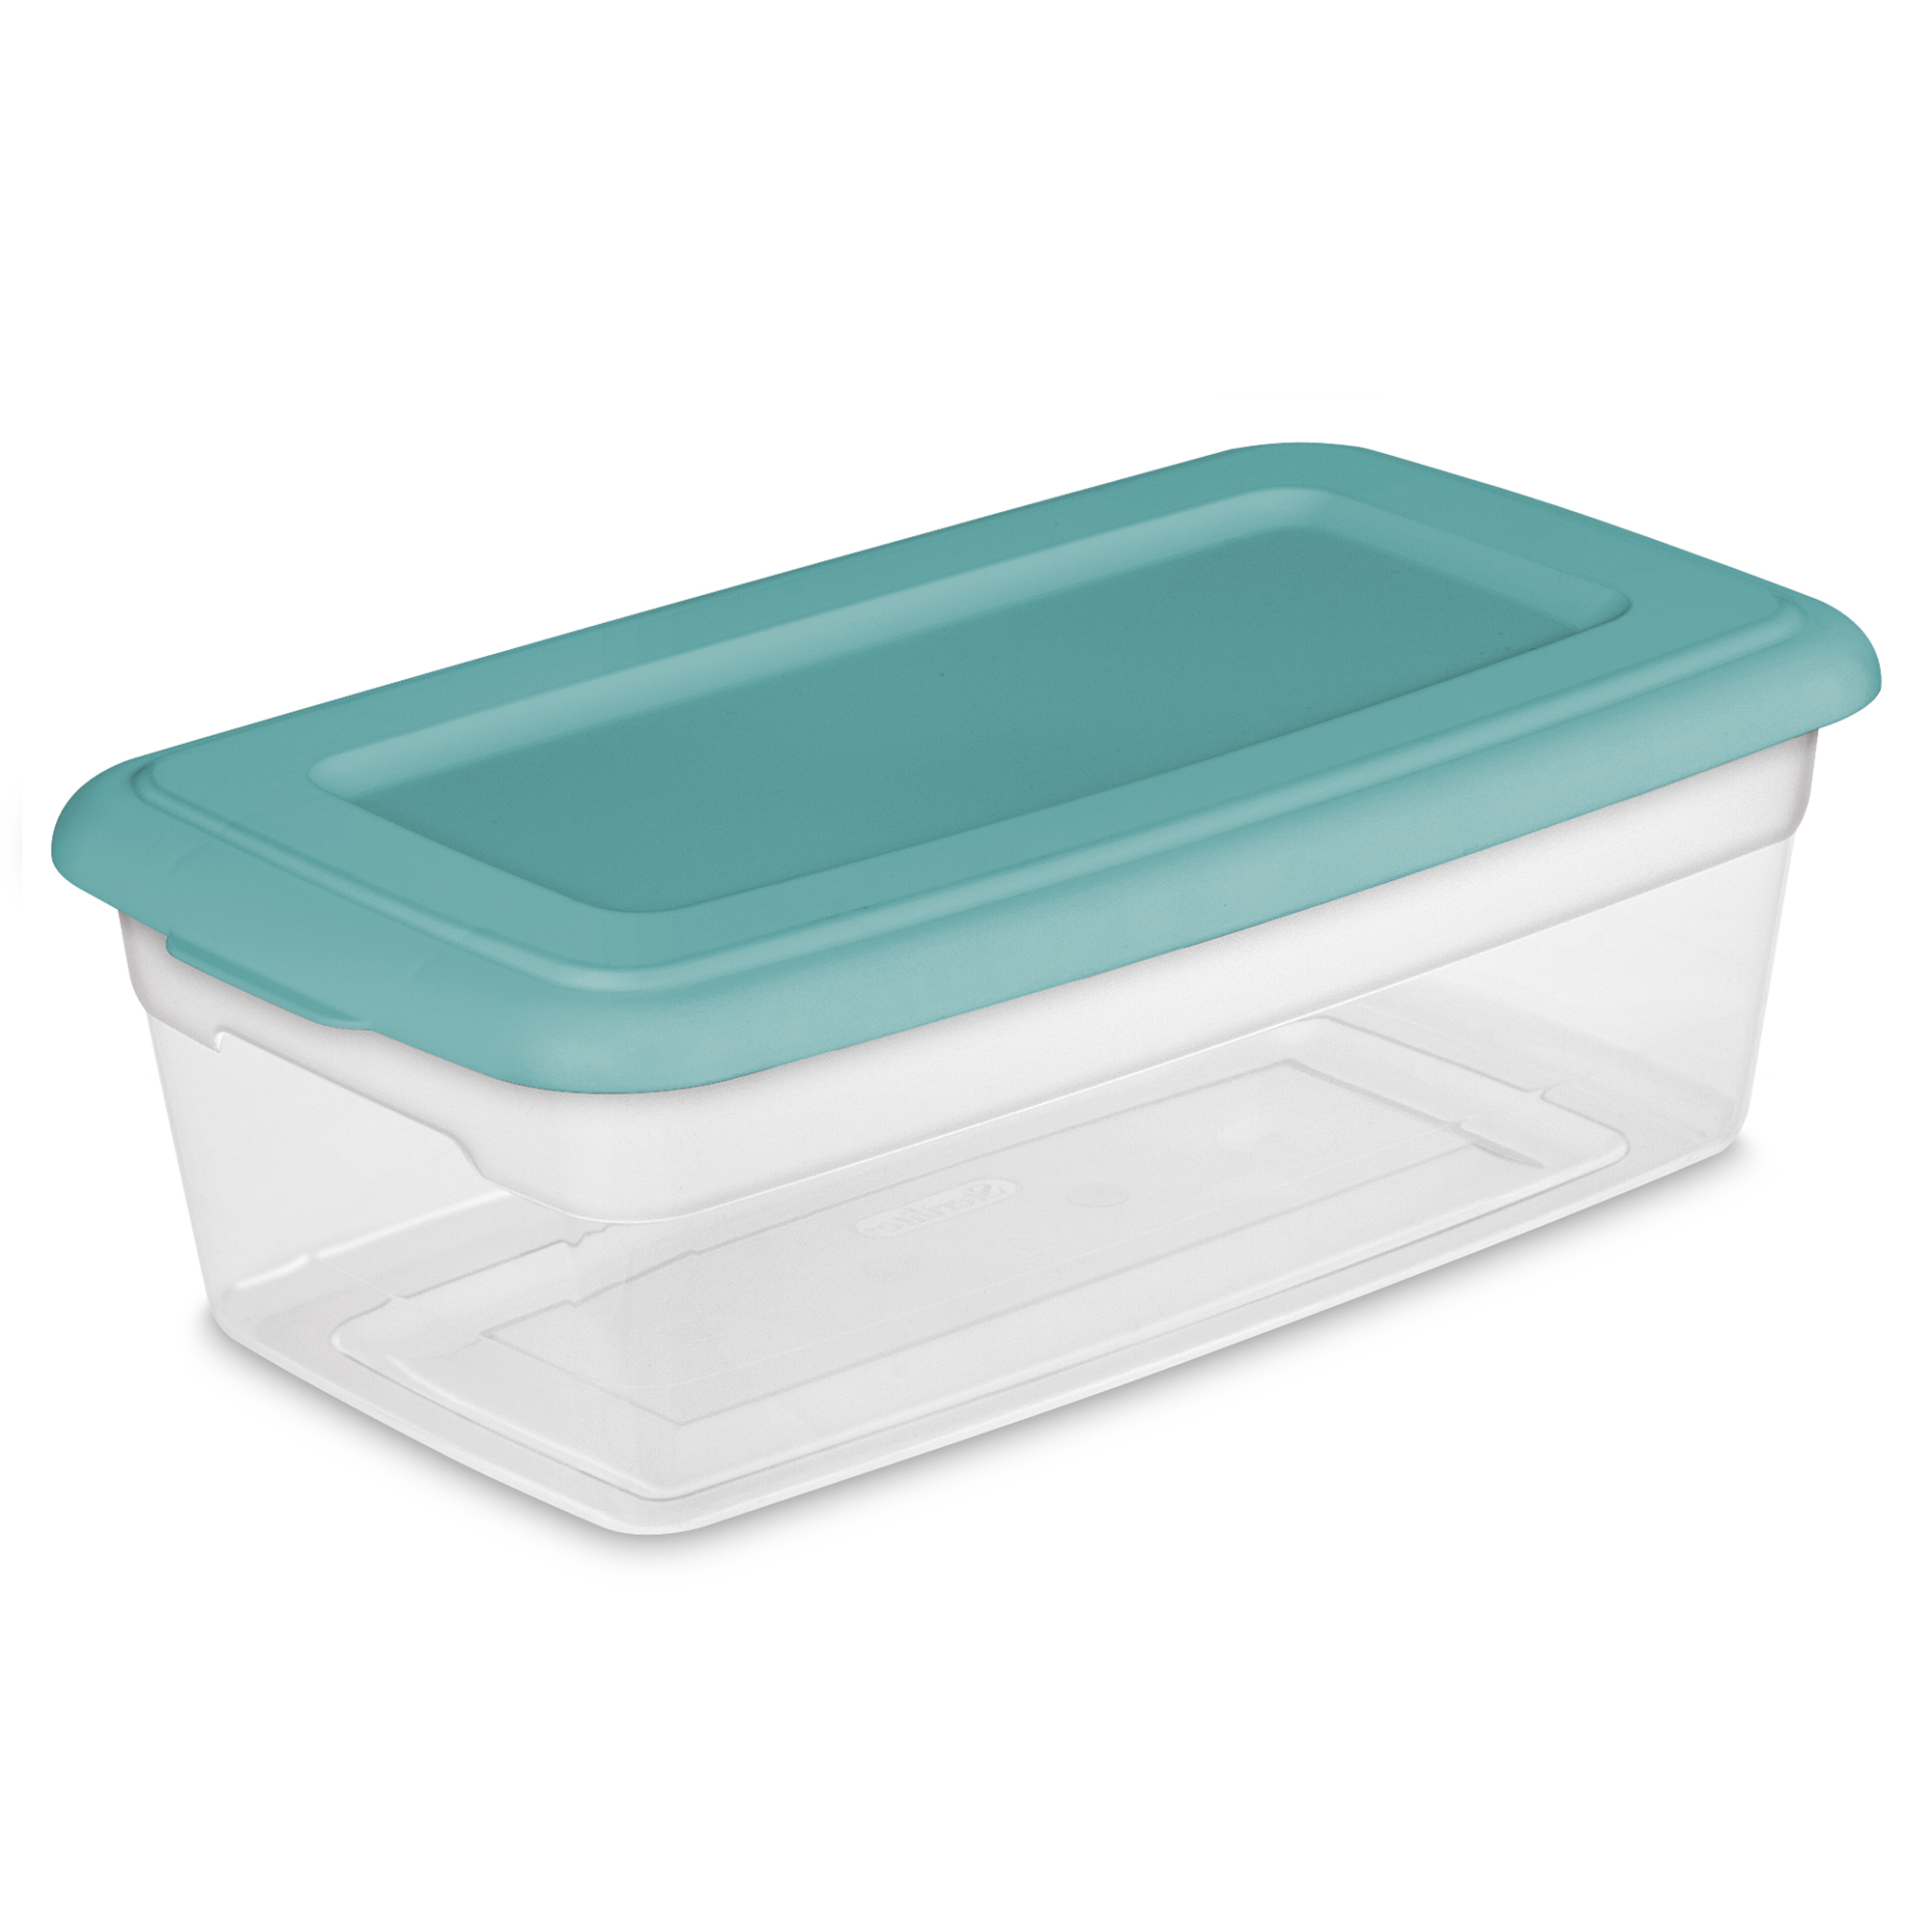 Sterilite 6 Quart Storage Box Peacock Plume Case of 36 Walmartcom